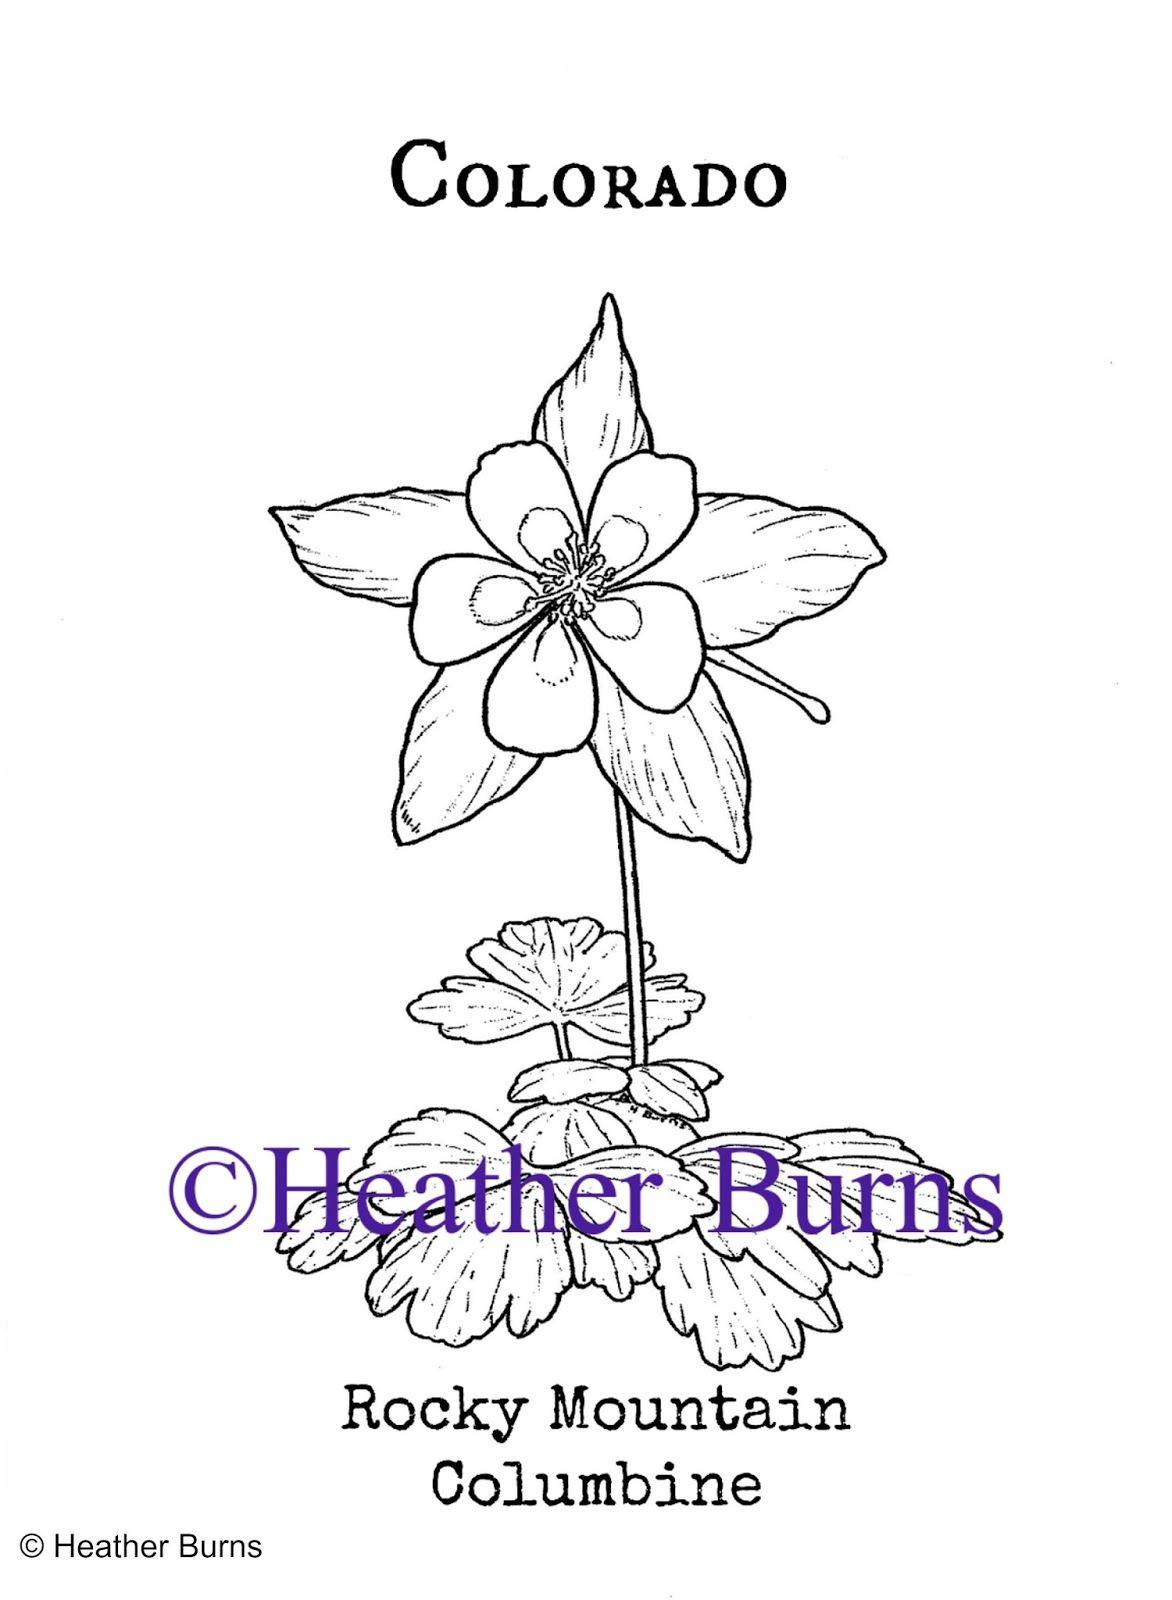 Colorado State Flower: Rocky Mountain Columbine | Pinterest | Flower